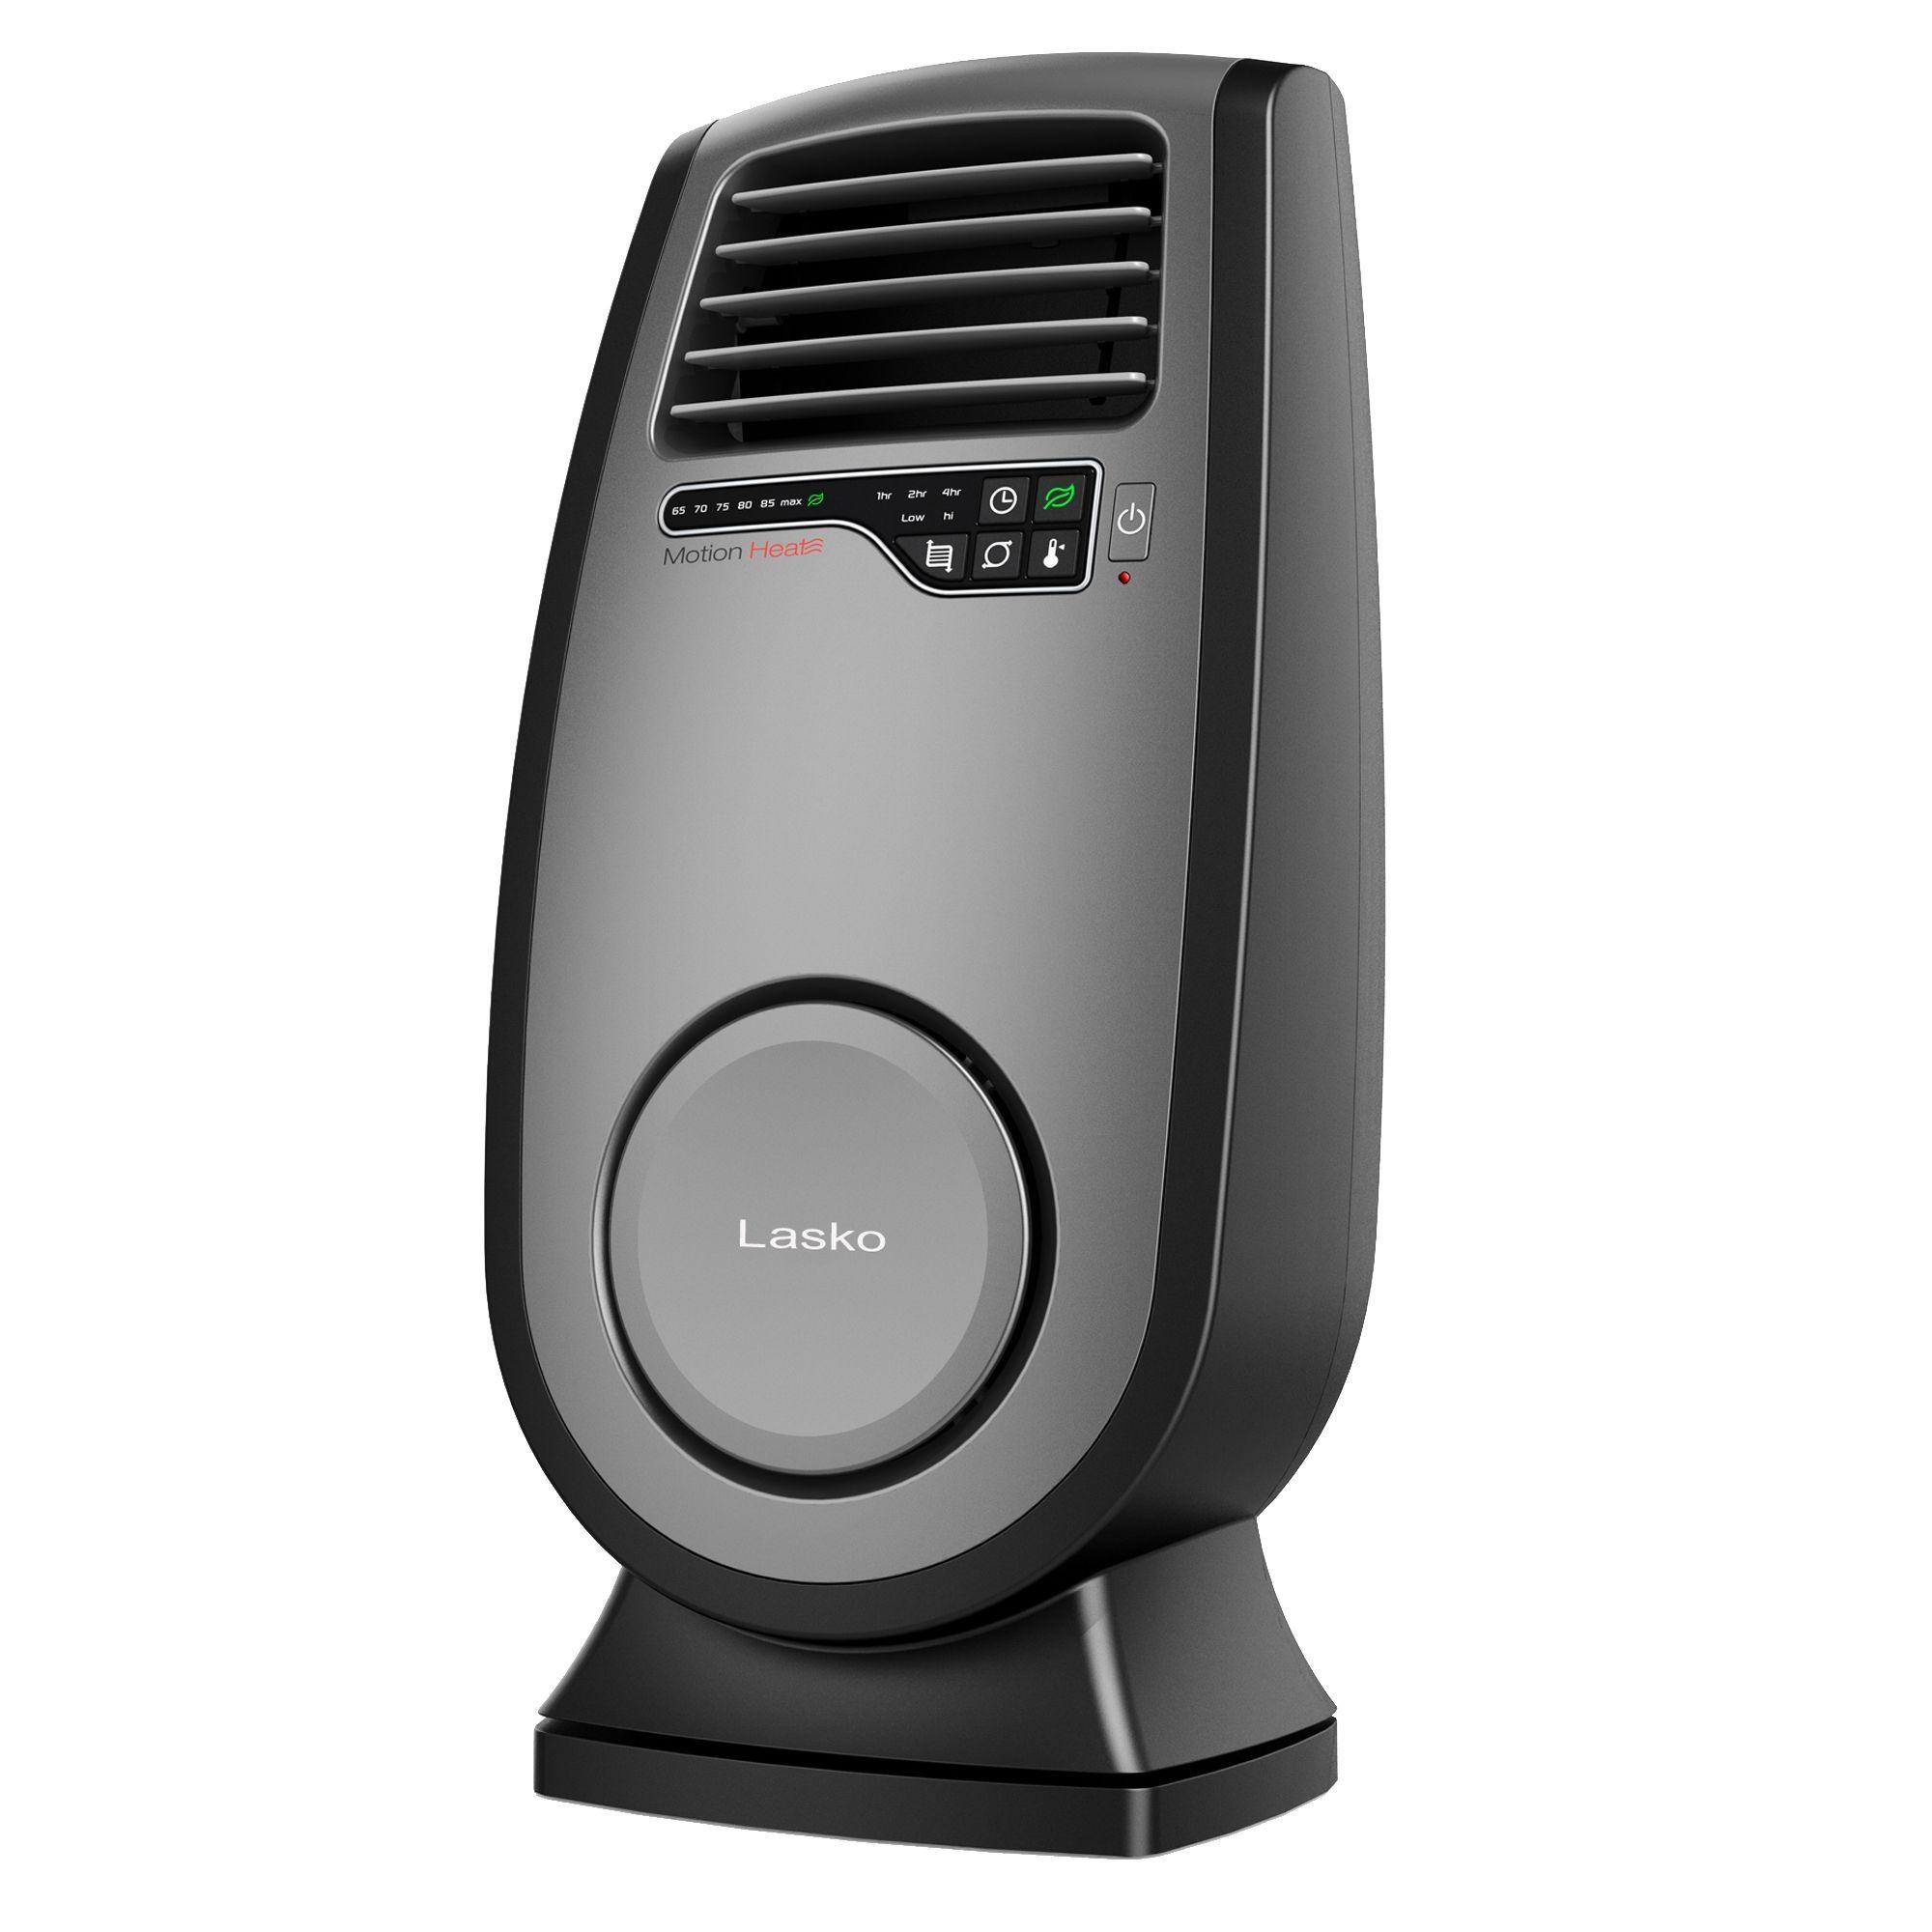 Lasko 3d Motion Heat Ceramic Heater Black Portable Heater Tower Heater Ceramics